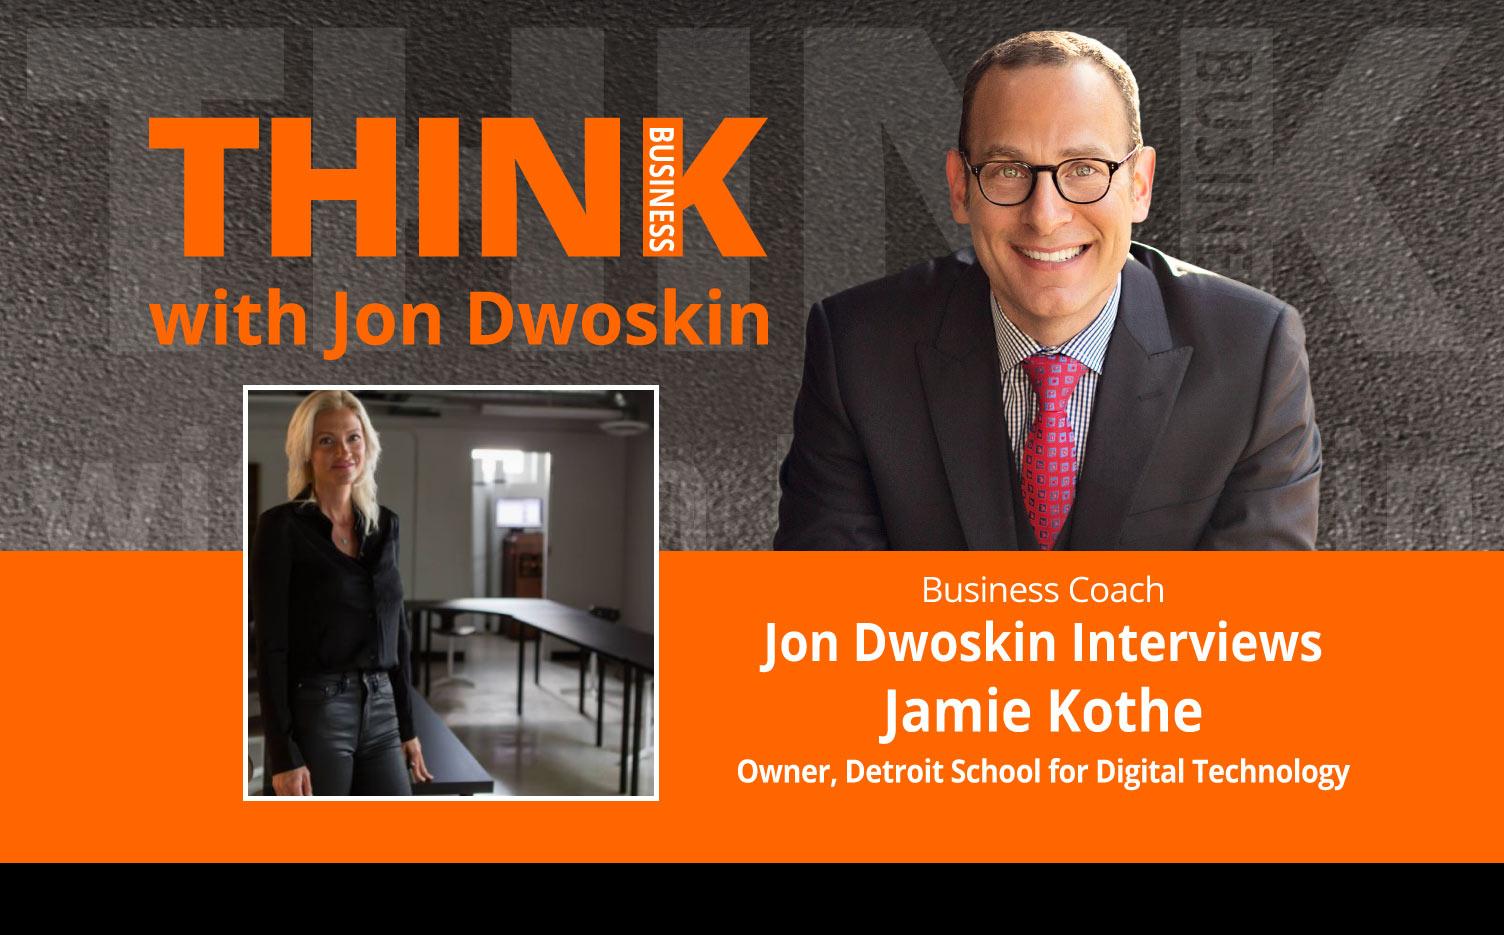 THINK Business Podcast: Jon Dwoskin Interviews Jamie Kothe, Owner, Detroit School for Digital Technology